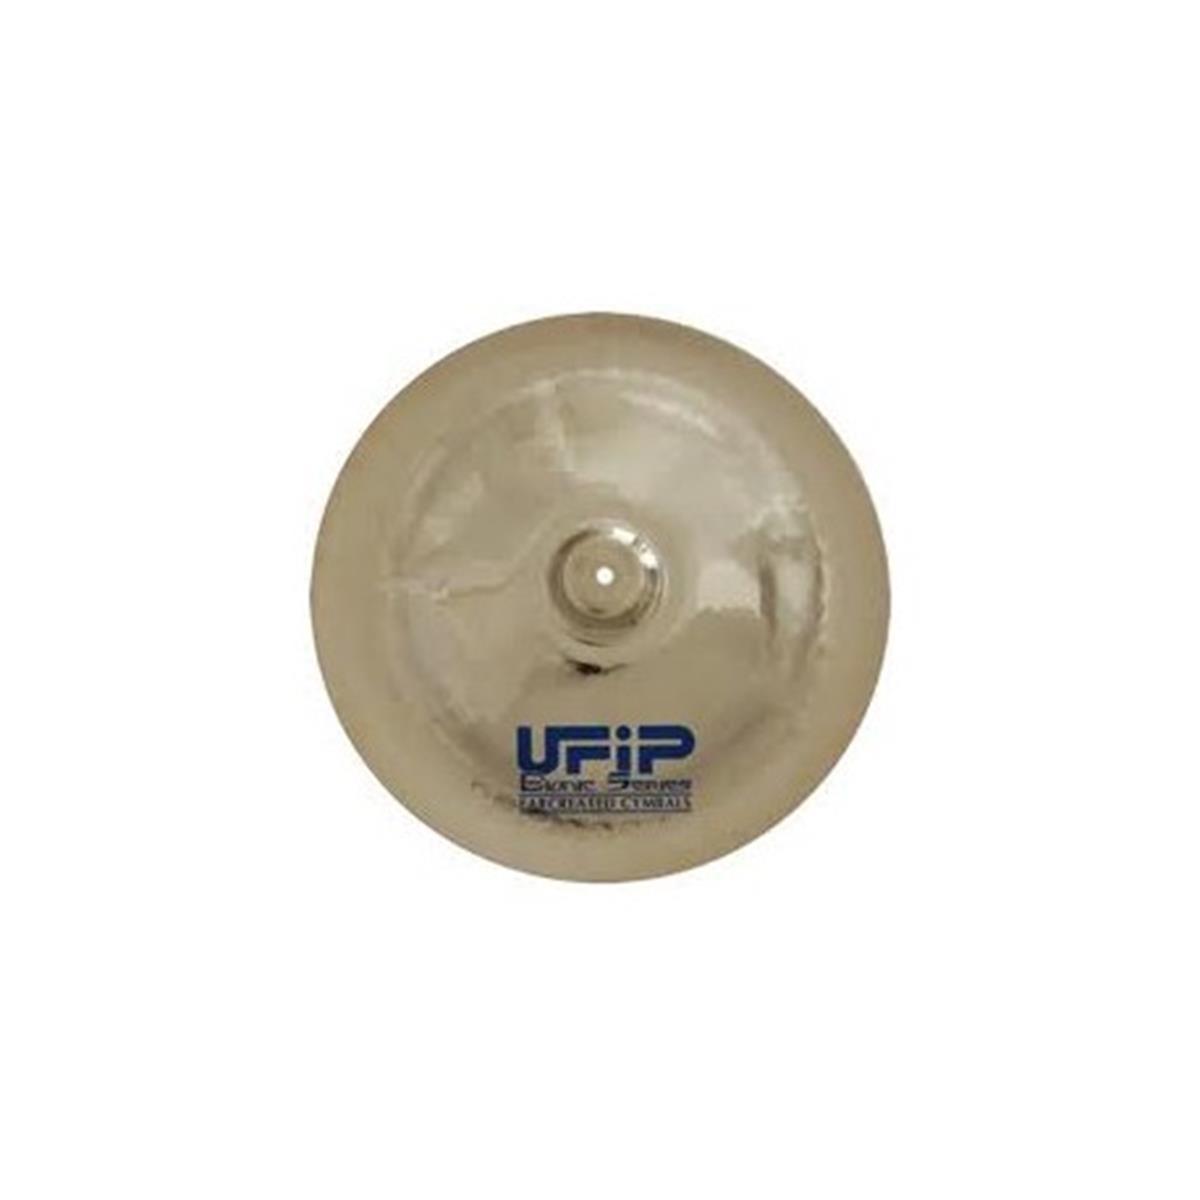 UFIP BIONIC CHINA 19